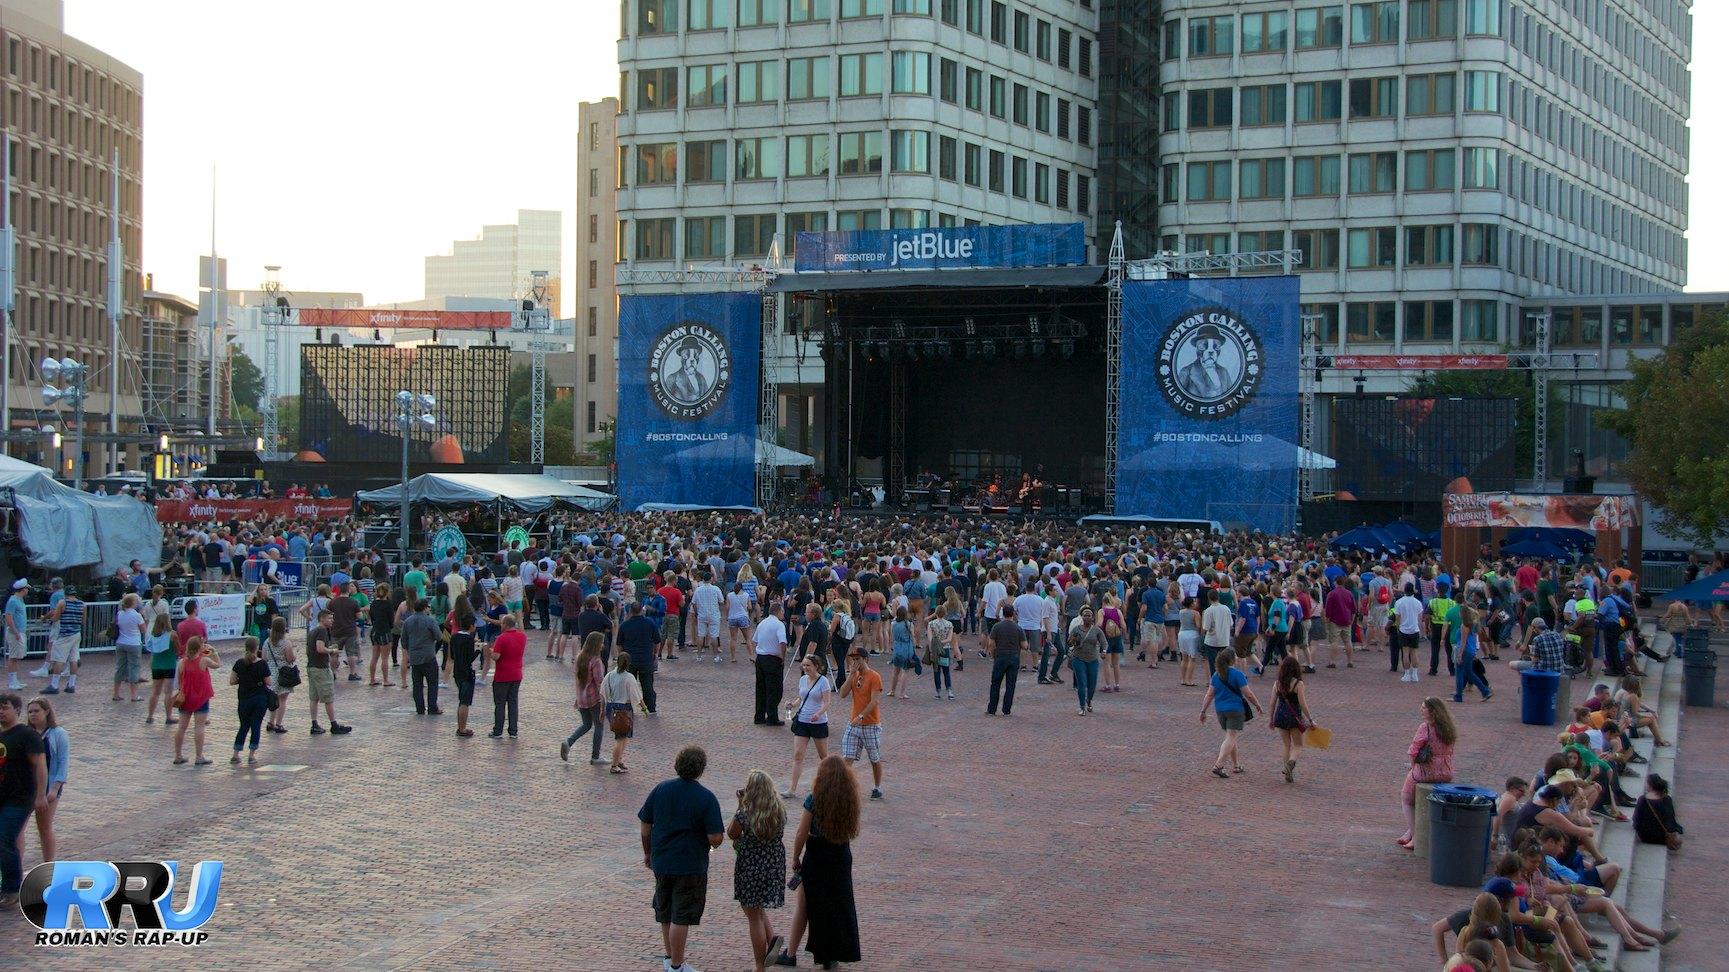 Boston Calling Music Festival (Benjamin Esakof/Roman's Rap-Up).